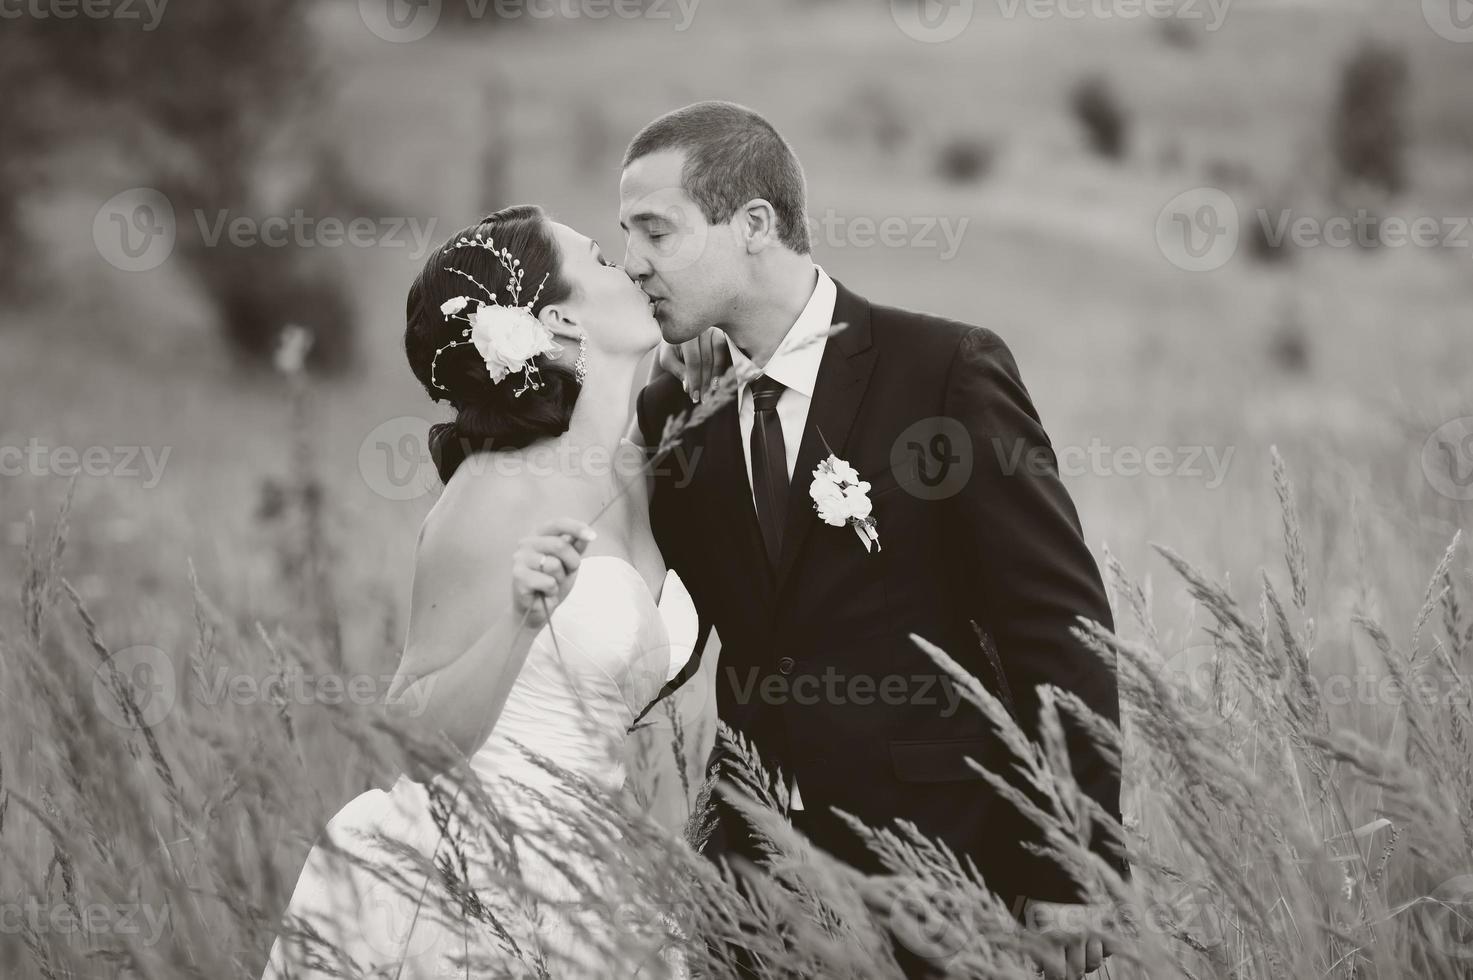 kaukasiska nygifta unga par. foto